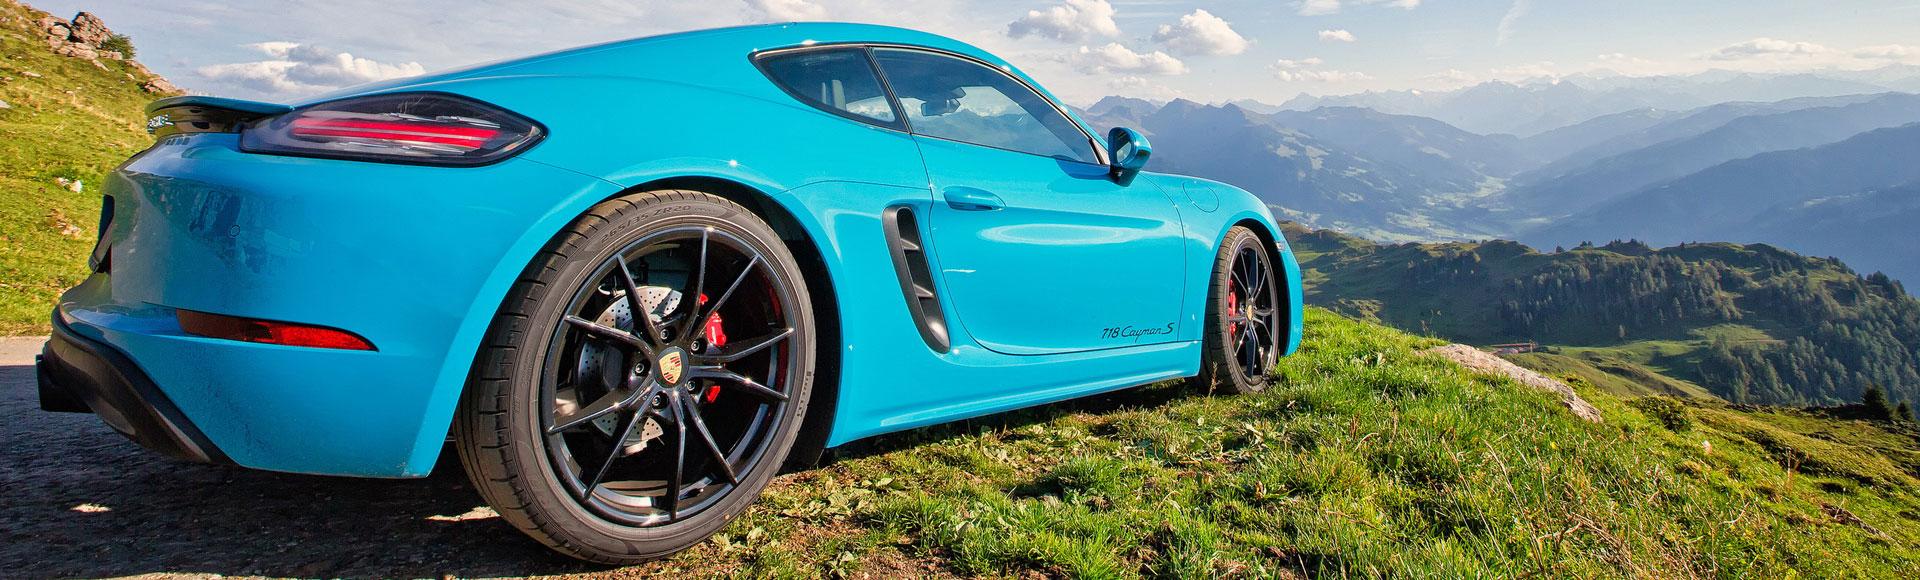 Porsche 718 Cayman 2016 132 Sommer